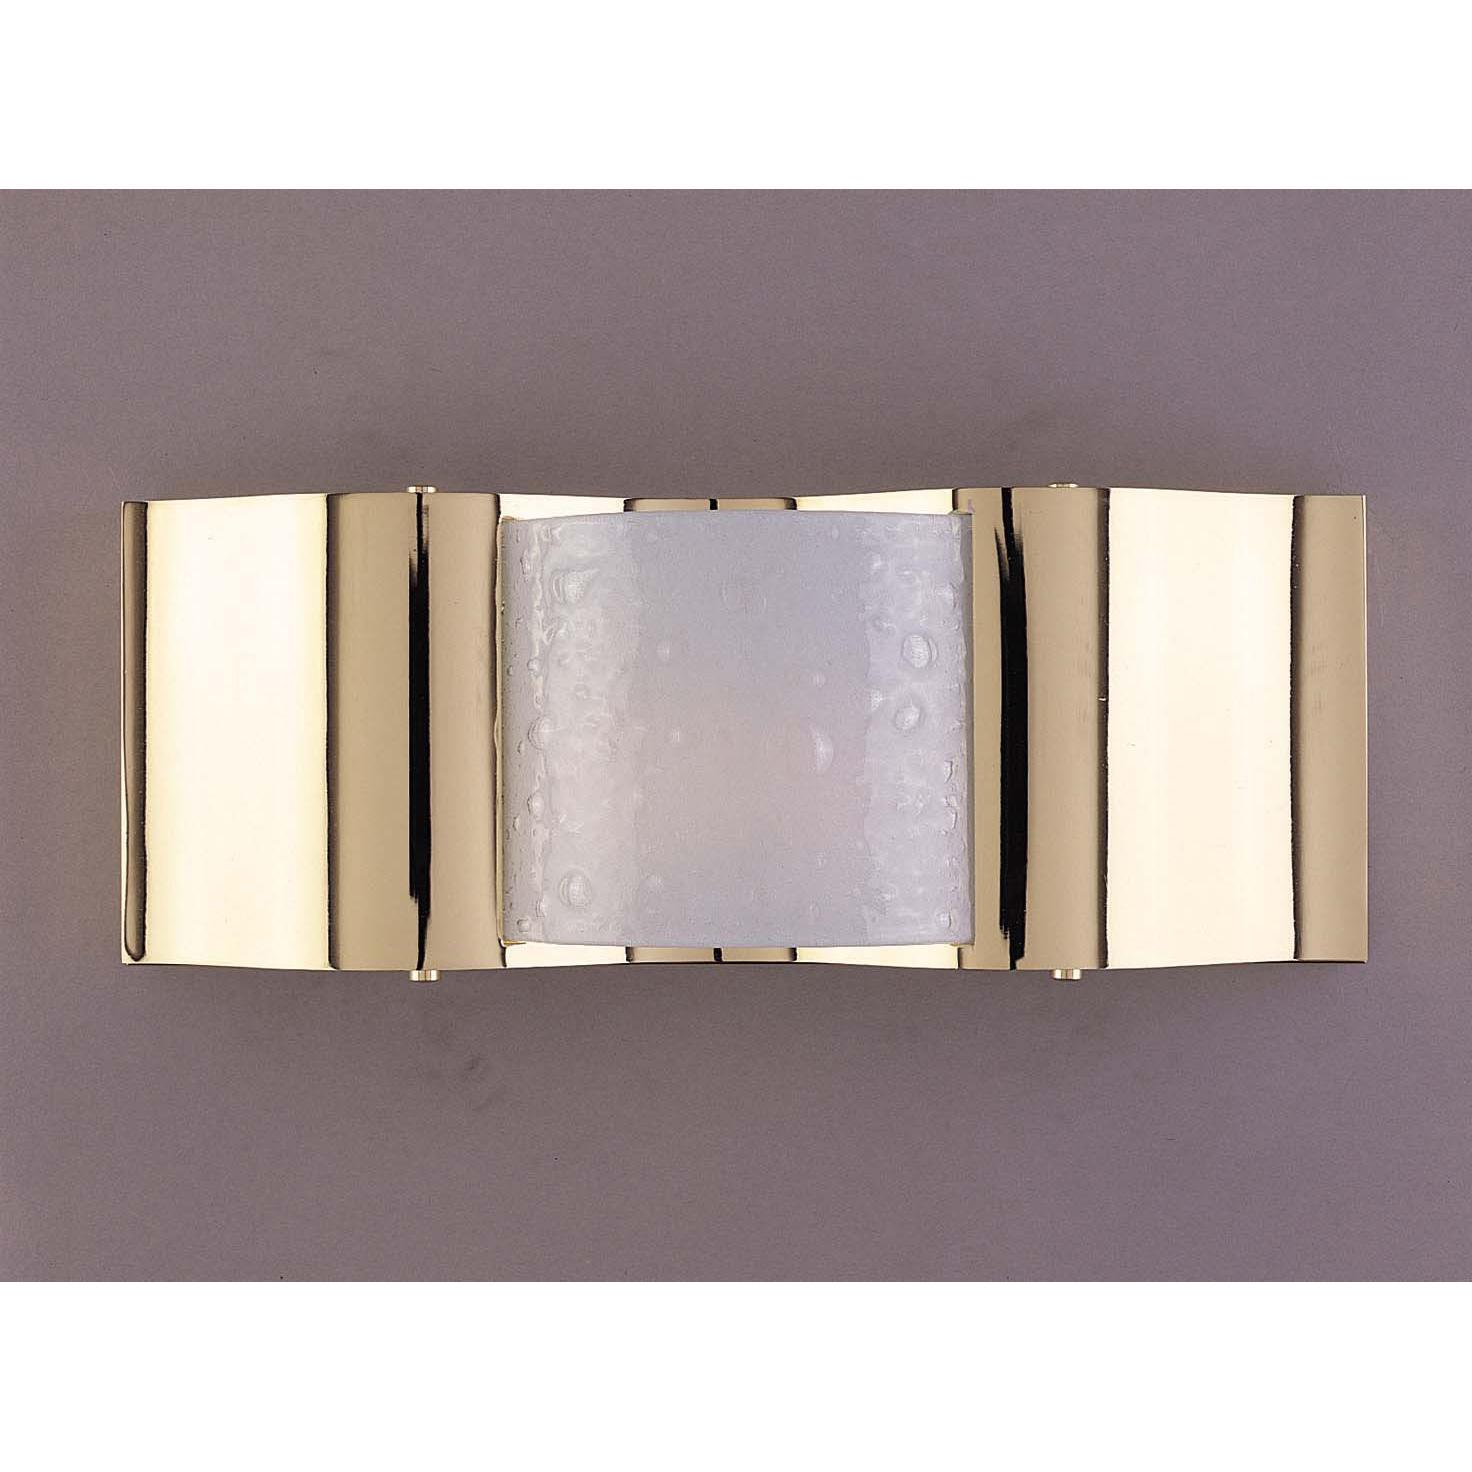 Metro 1-light Halogen Brass Wall Sconce